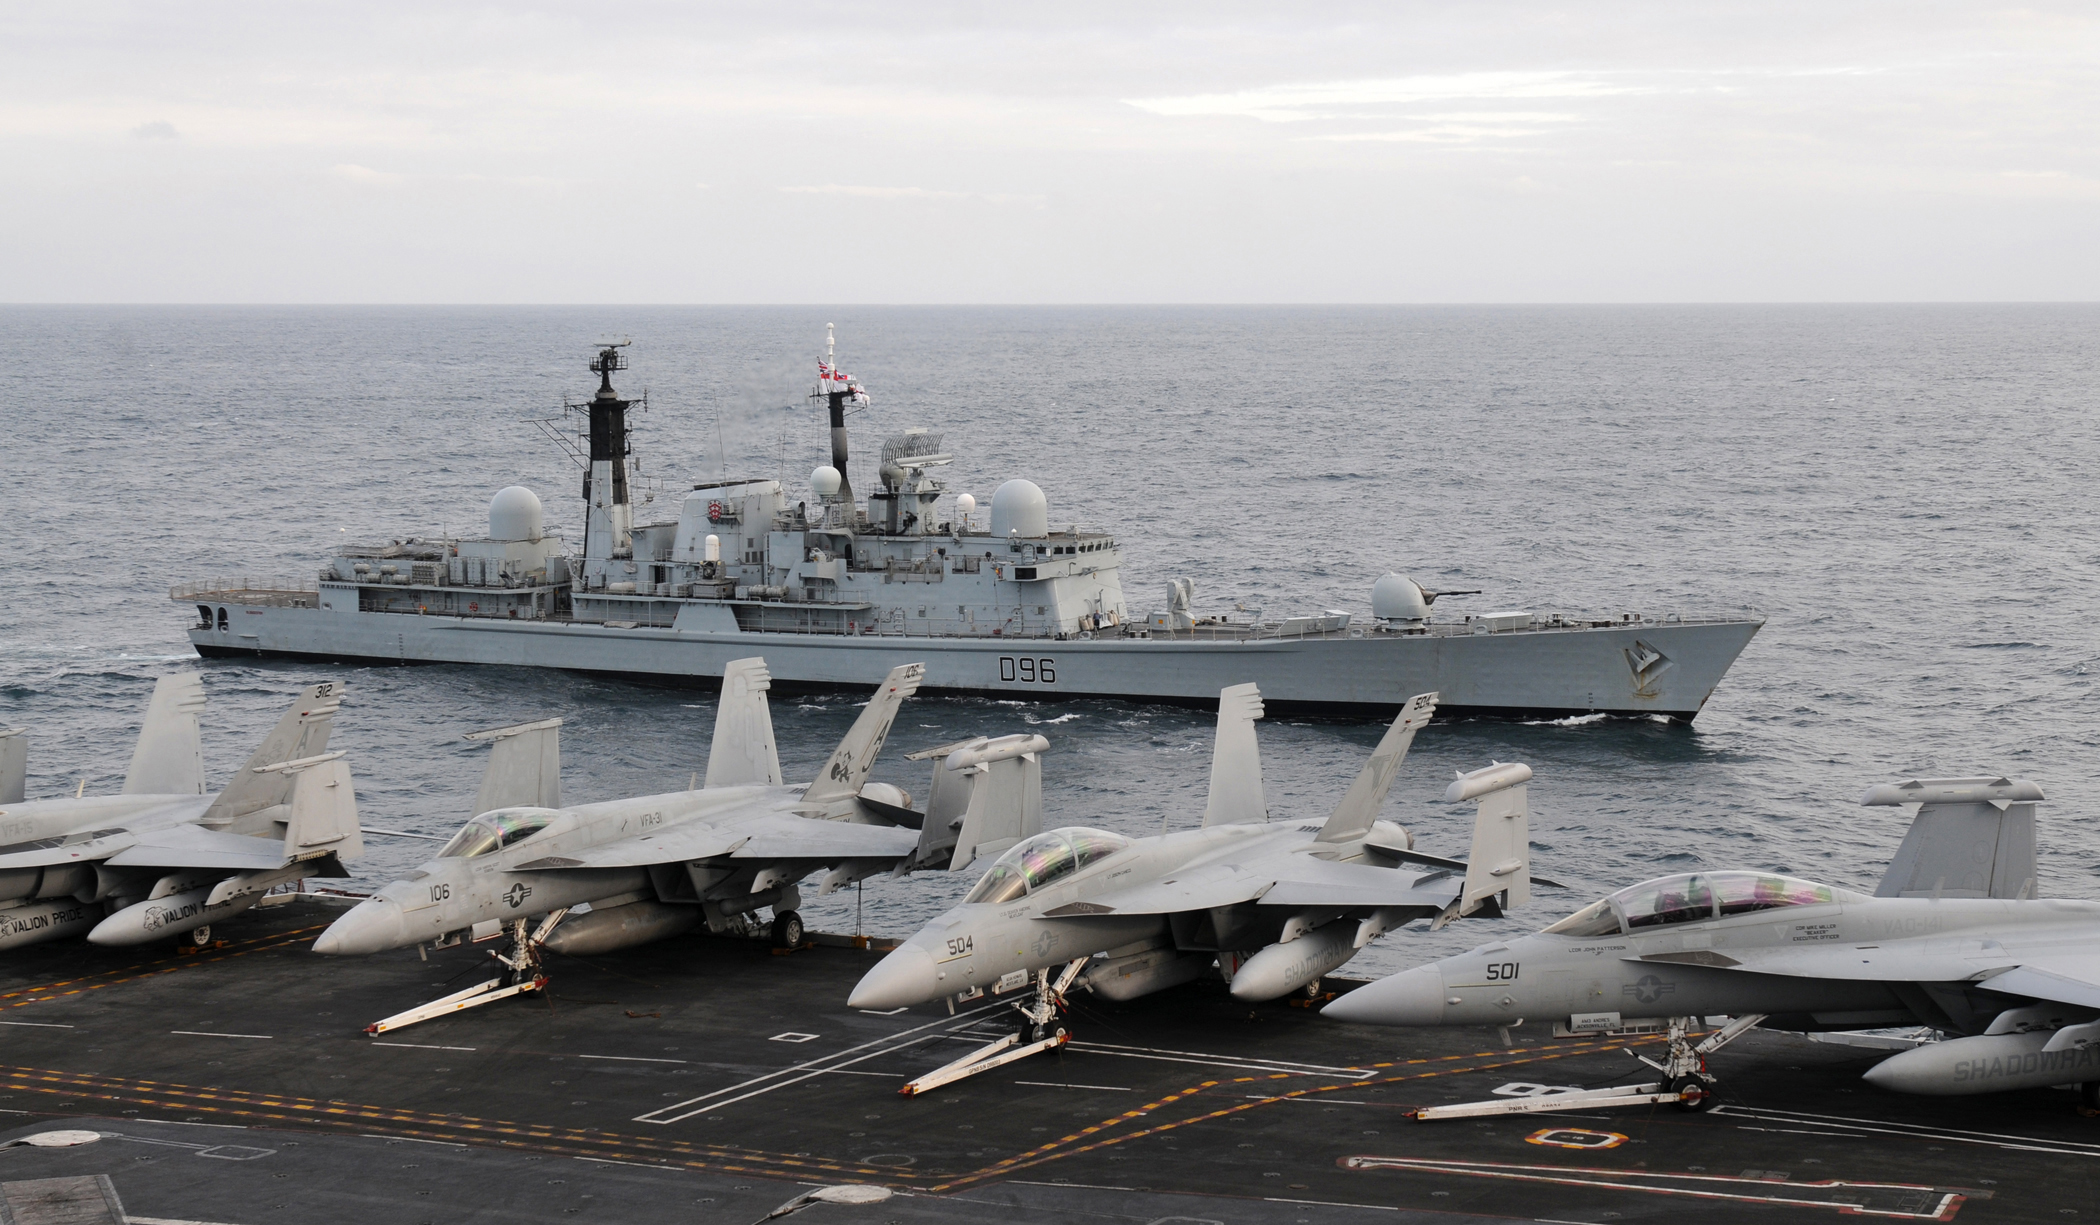 Moment HMS Queen Elizabeth met up with USS George H.W